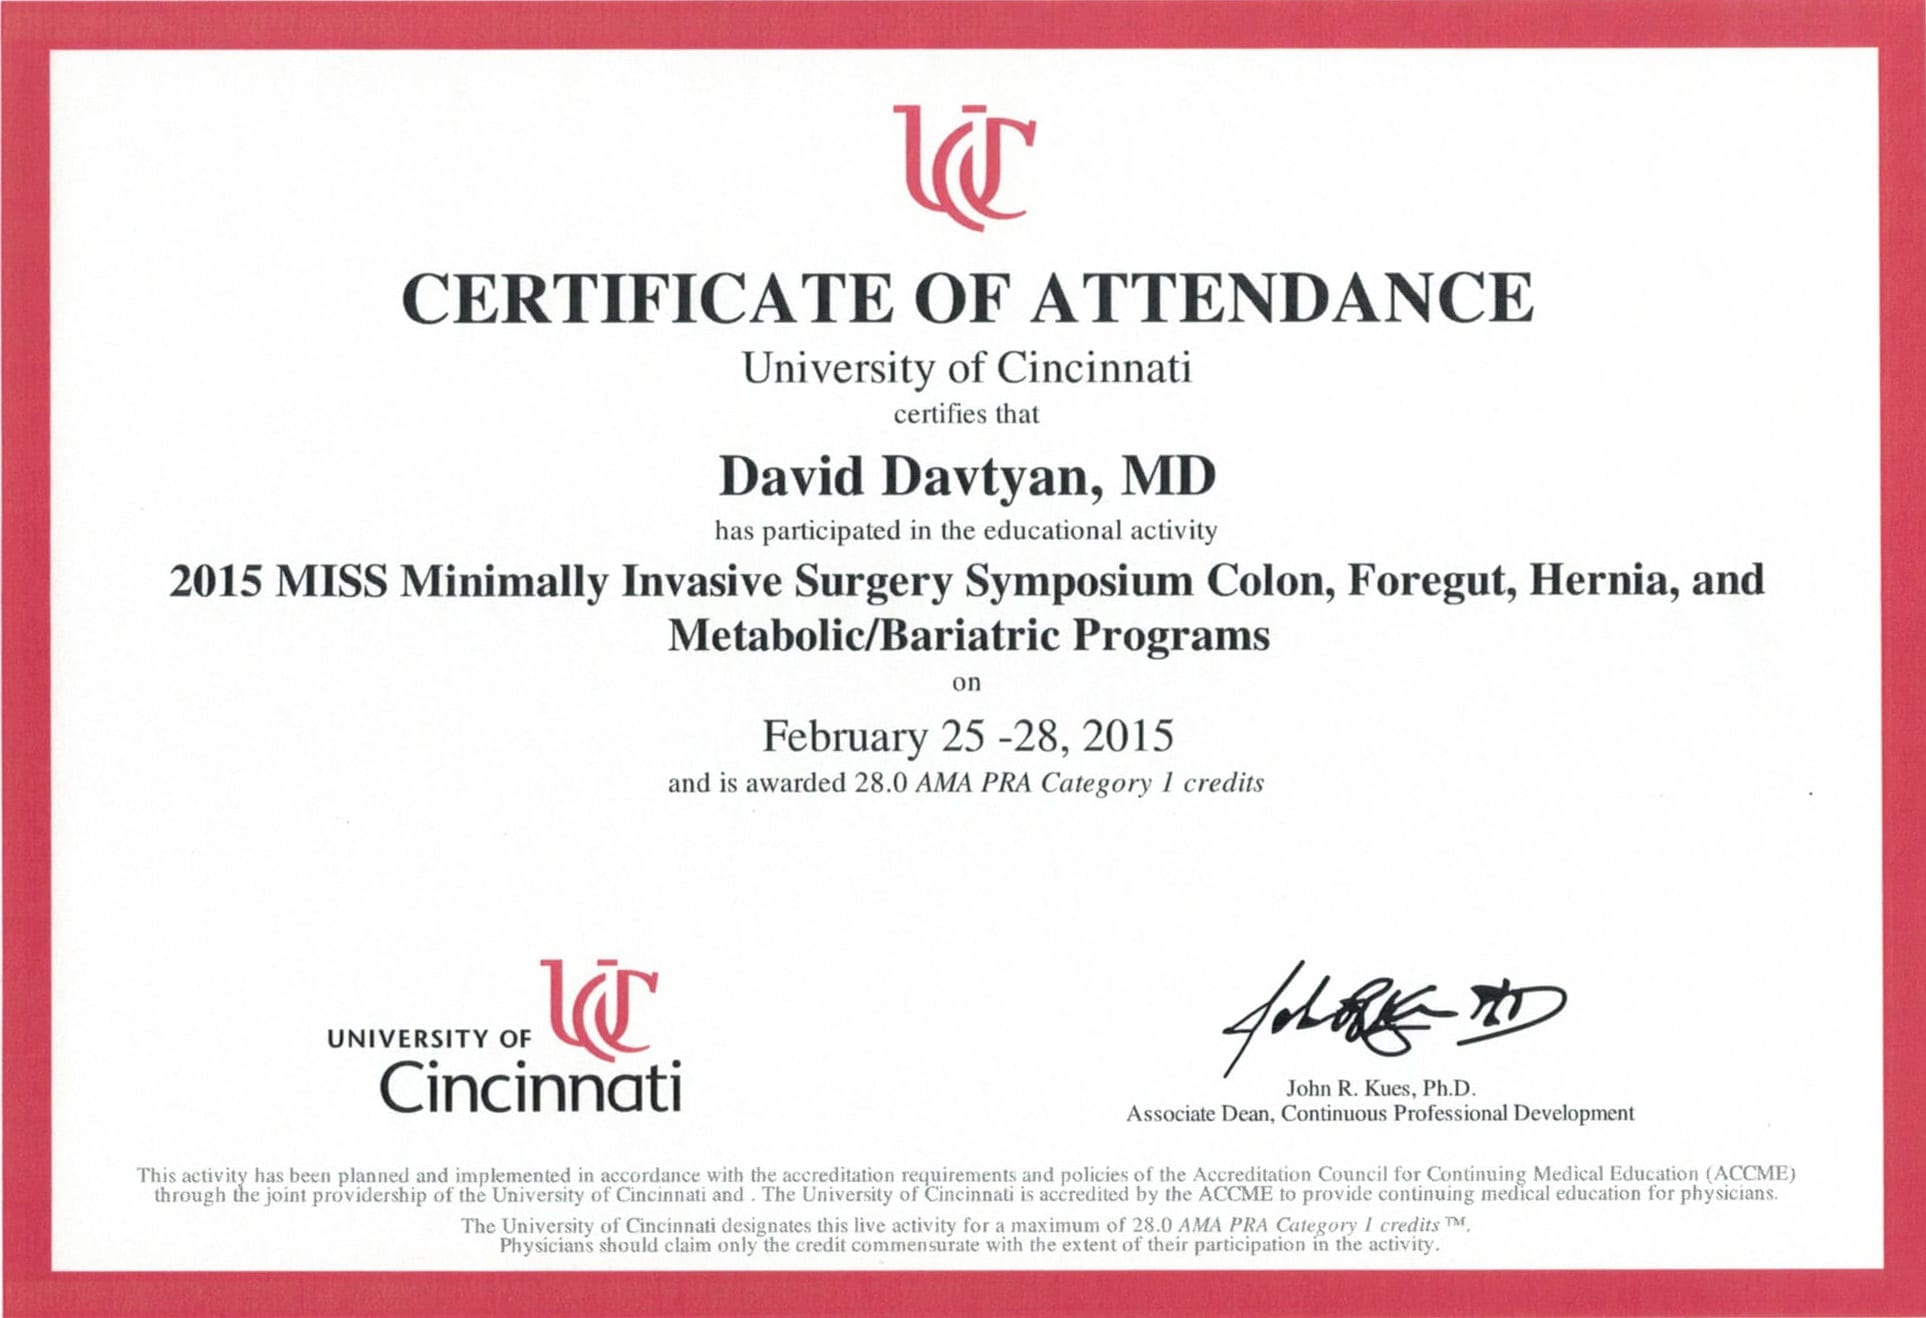 Dr. David Davtyan's 2015 Certificate University of Cincinnati MISS Minimally Invasive Surgery Symposium Colon Foregut Hernia